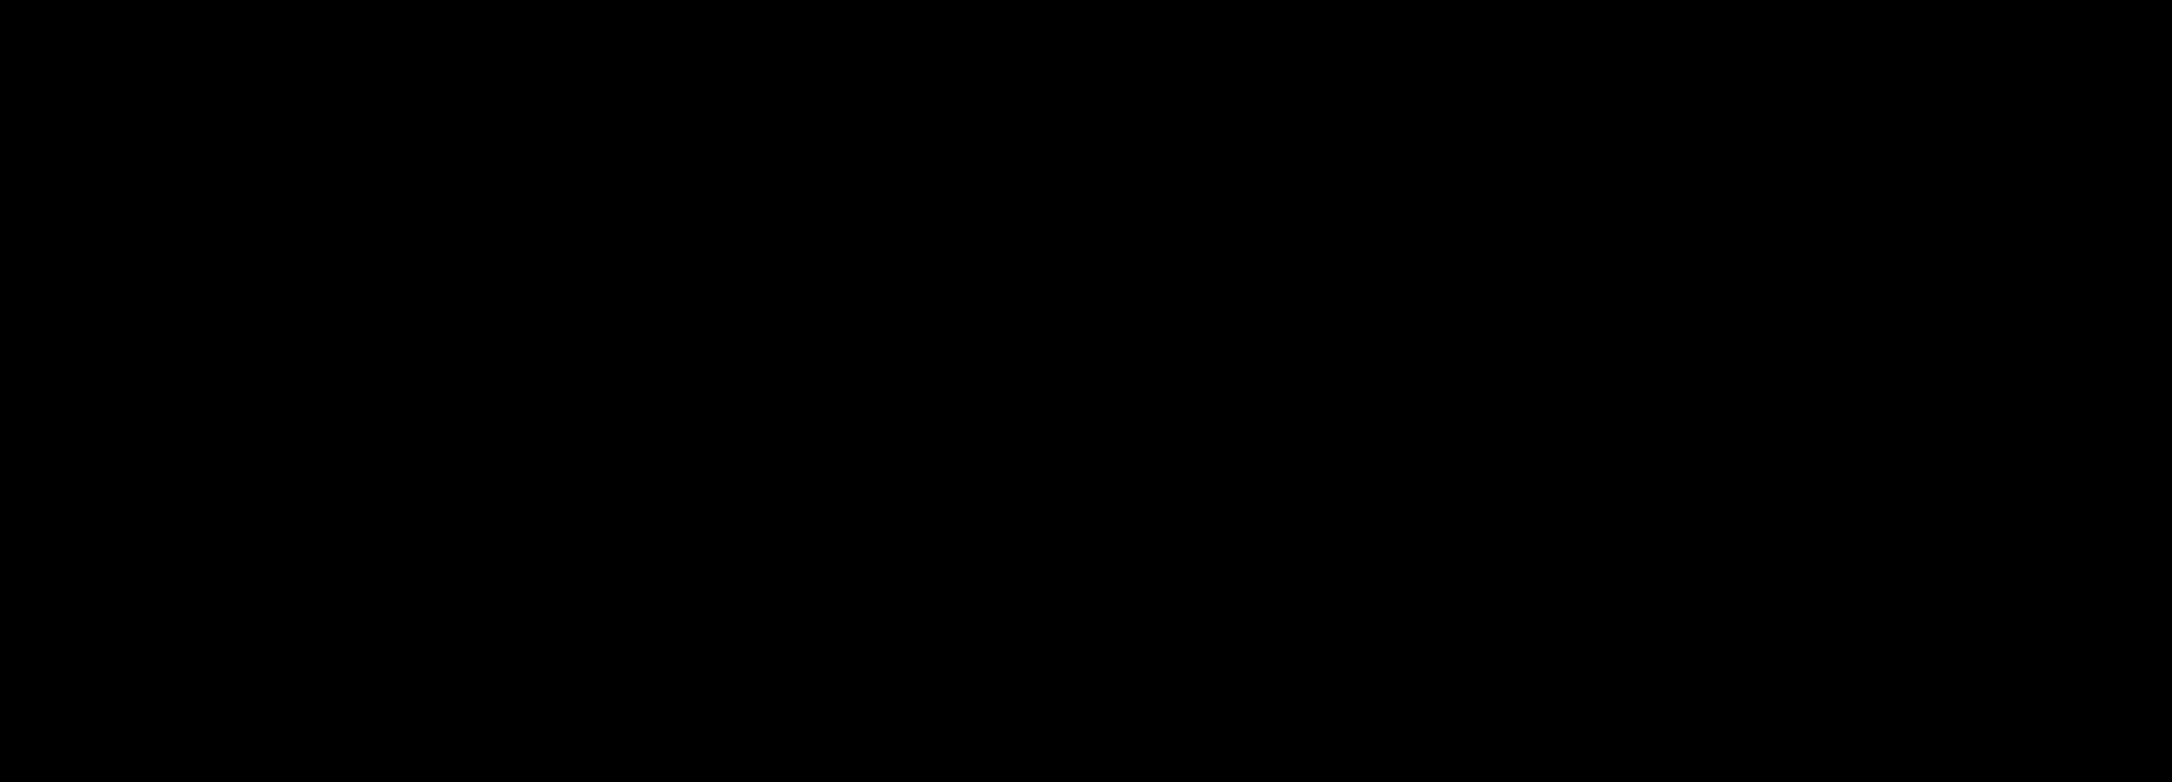 (N-Methyl-d<sub>3</sub>-N-biotinyl)-6-aminohexanoic acid